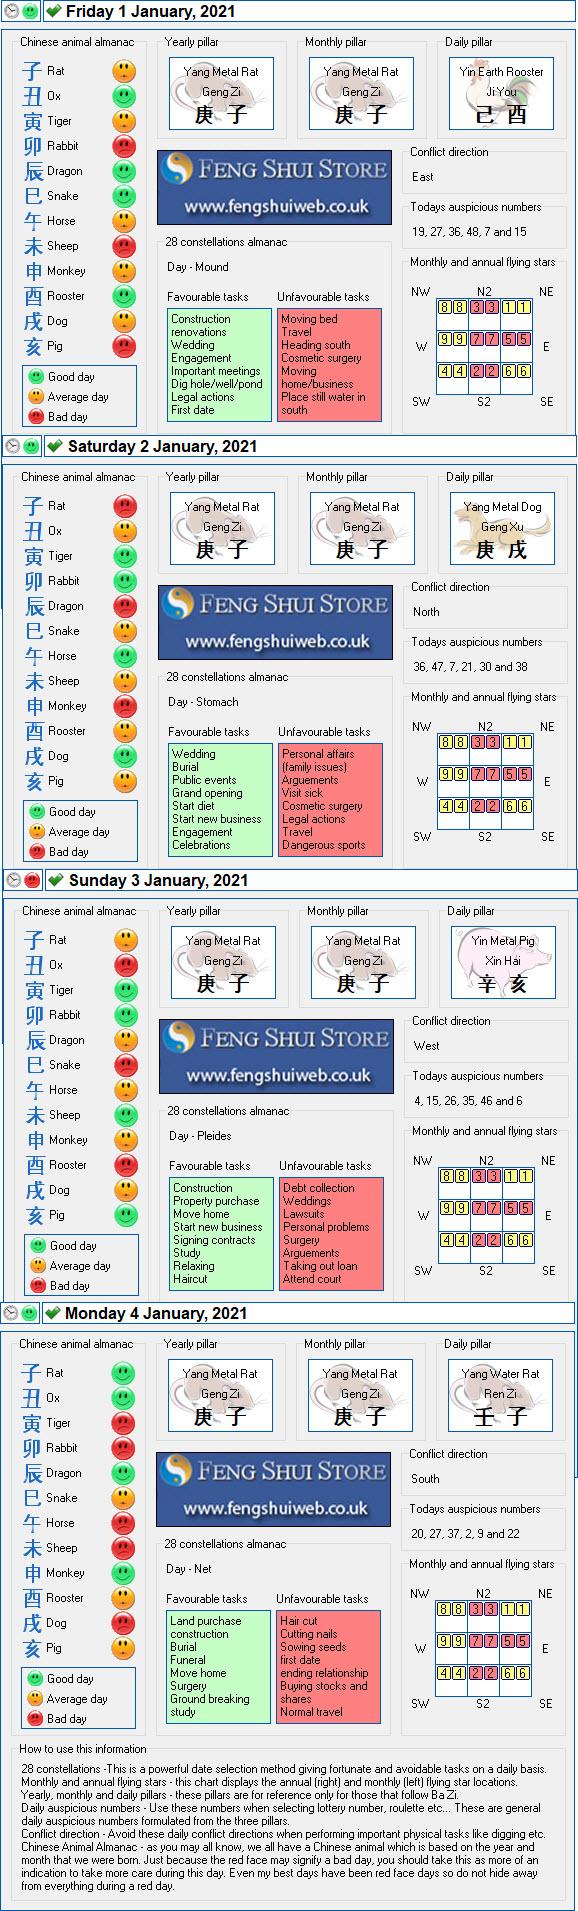 Tong Shu Almanac for Friday 1st - Monday 4th January 2021